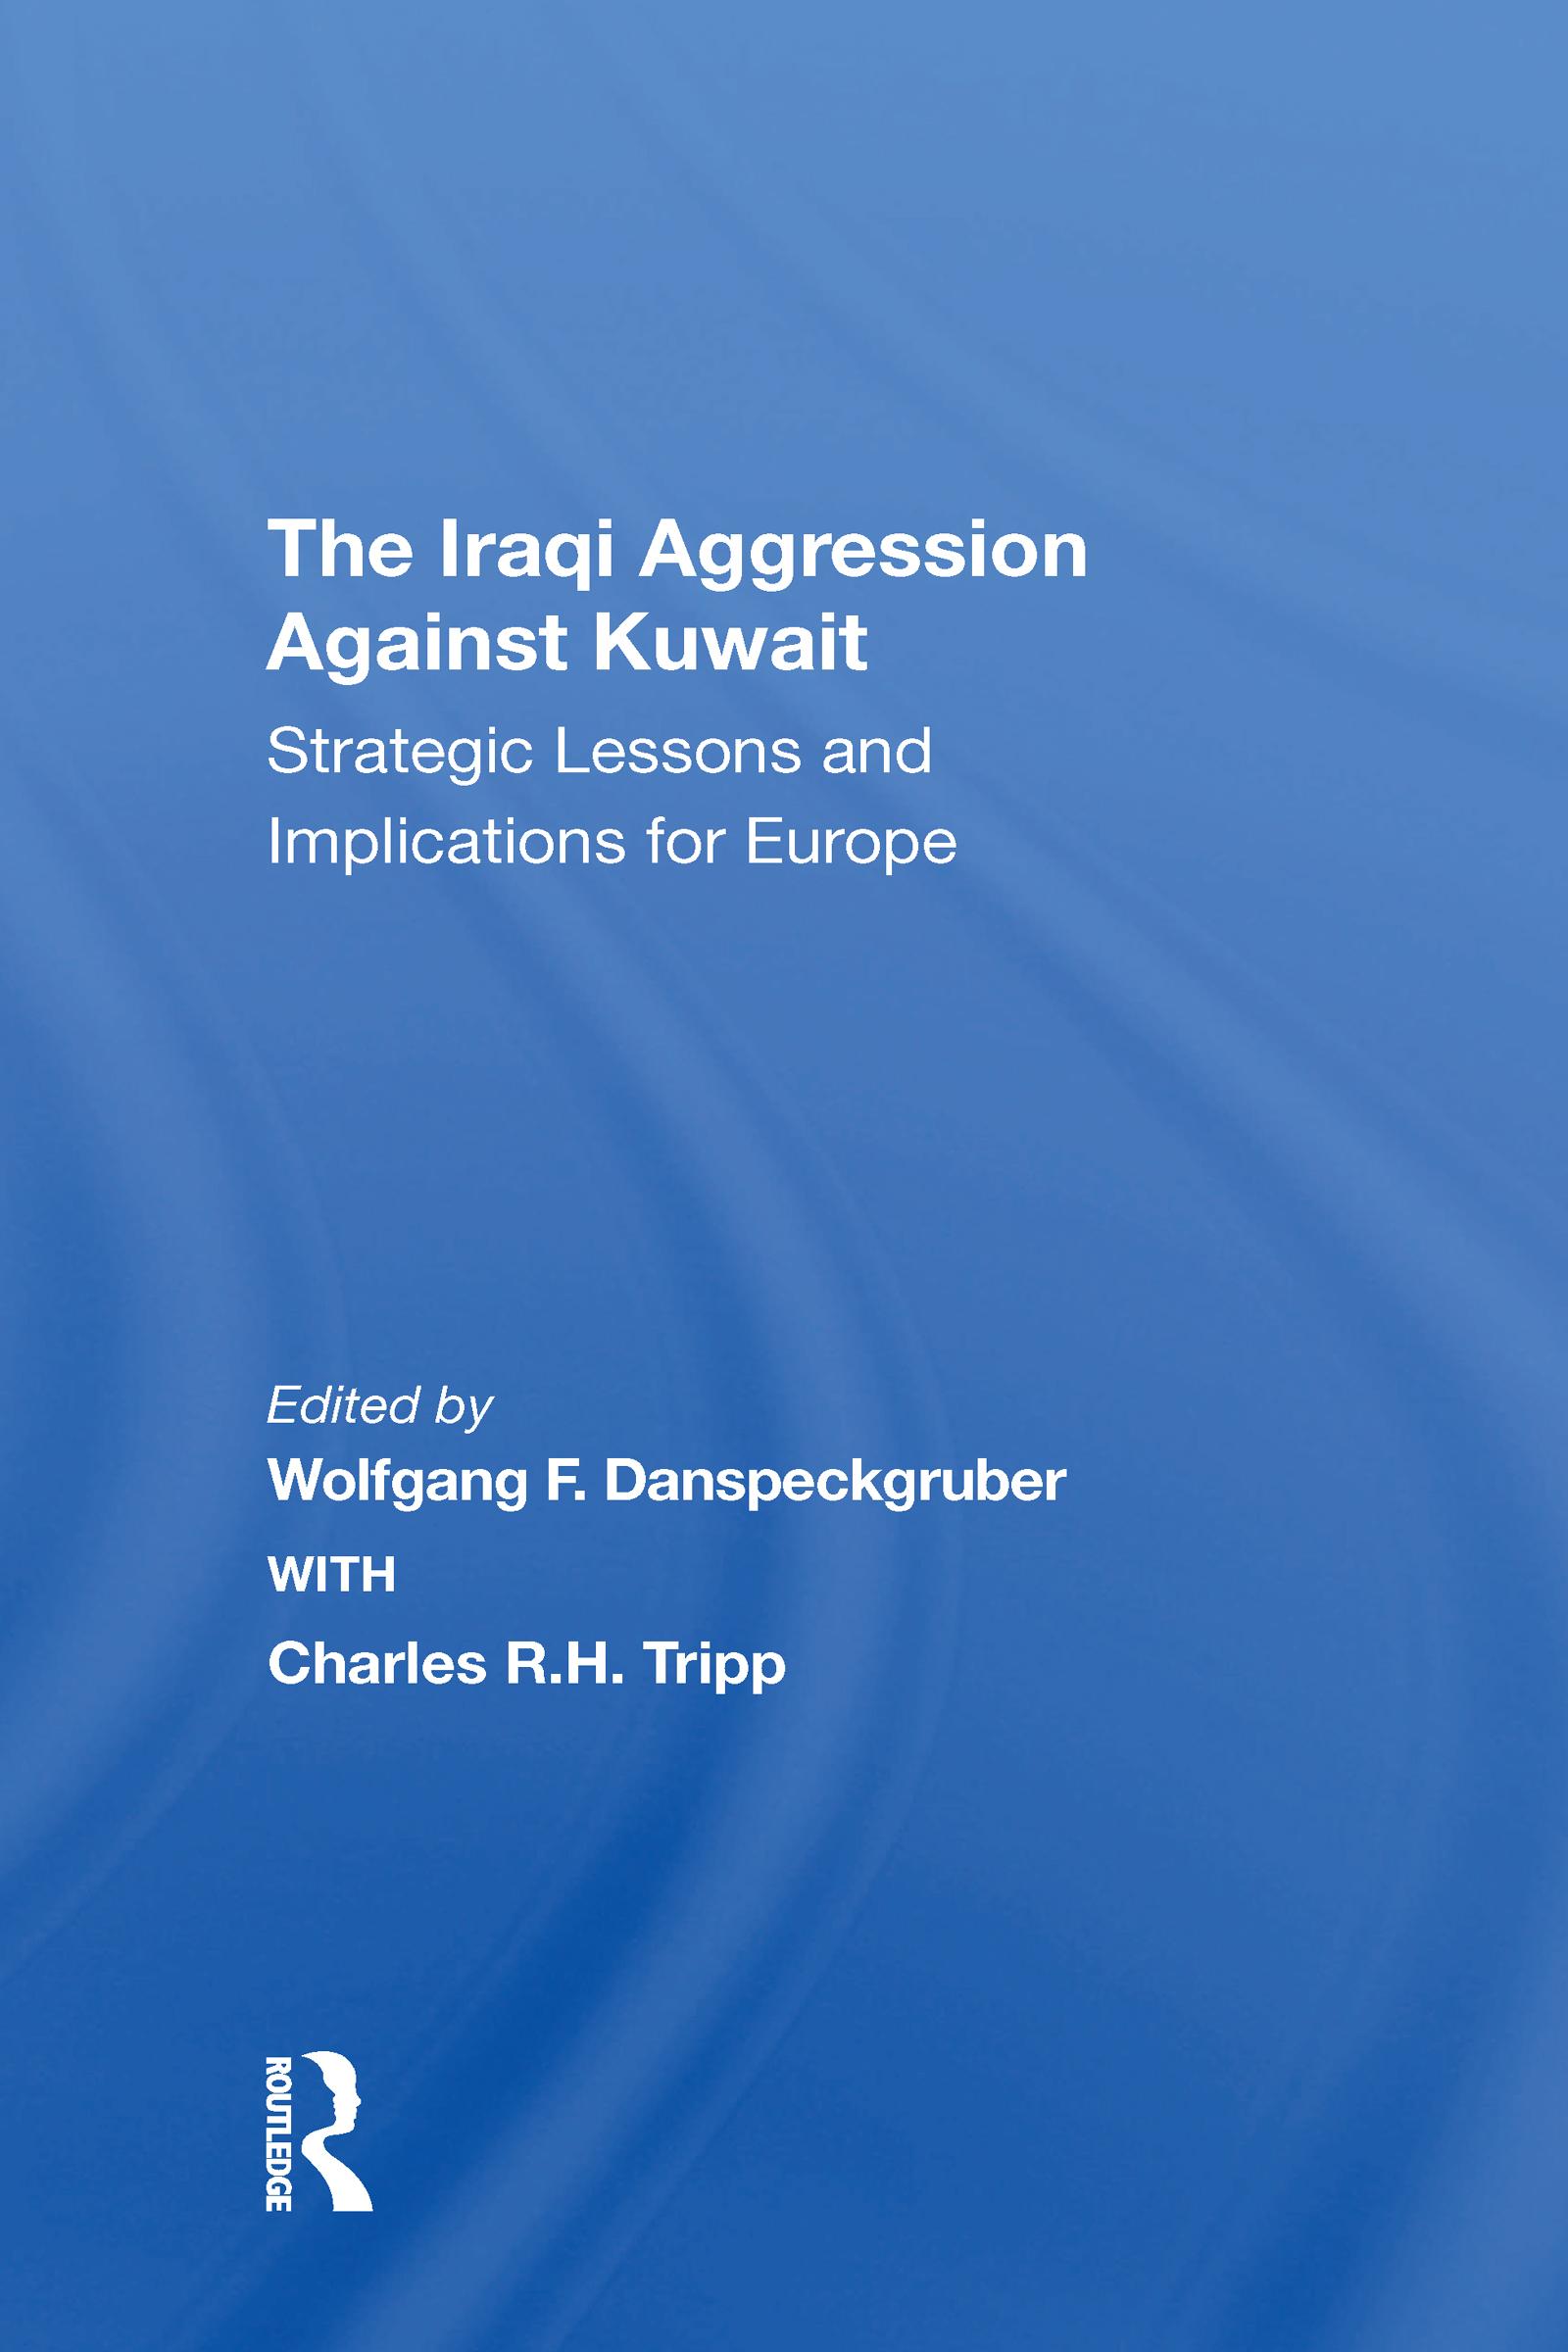 The Iraqi Aggression Against Kuwait